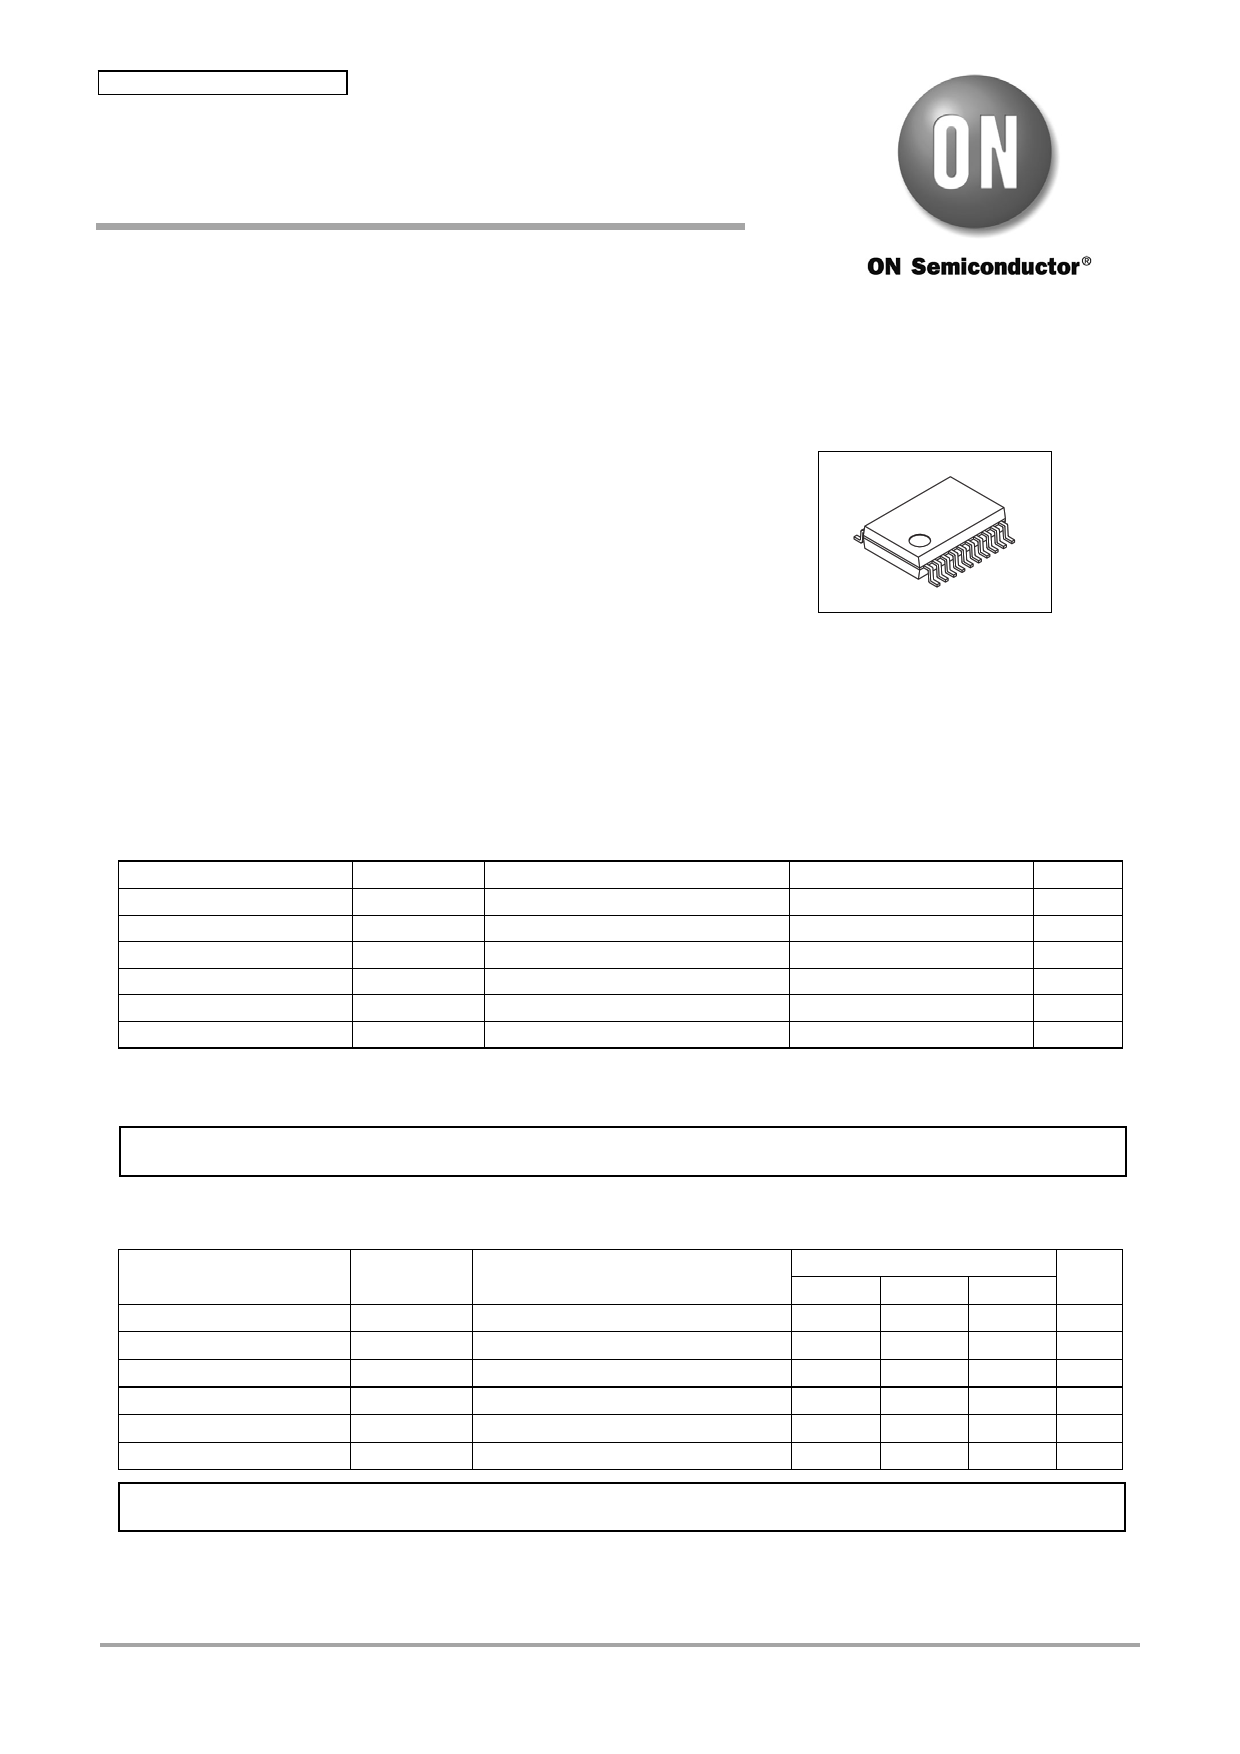 LB1843V datasheet